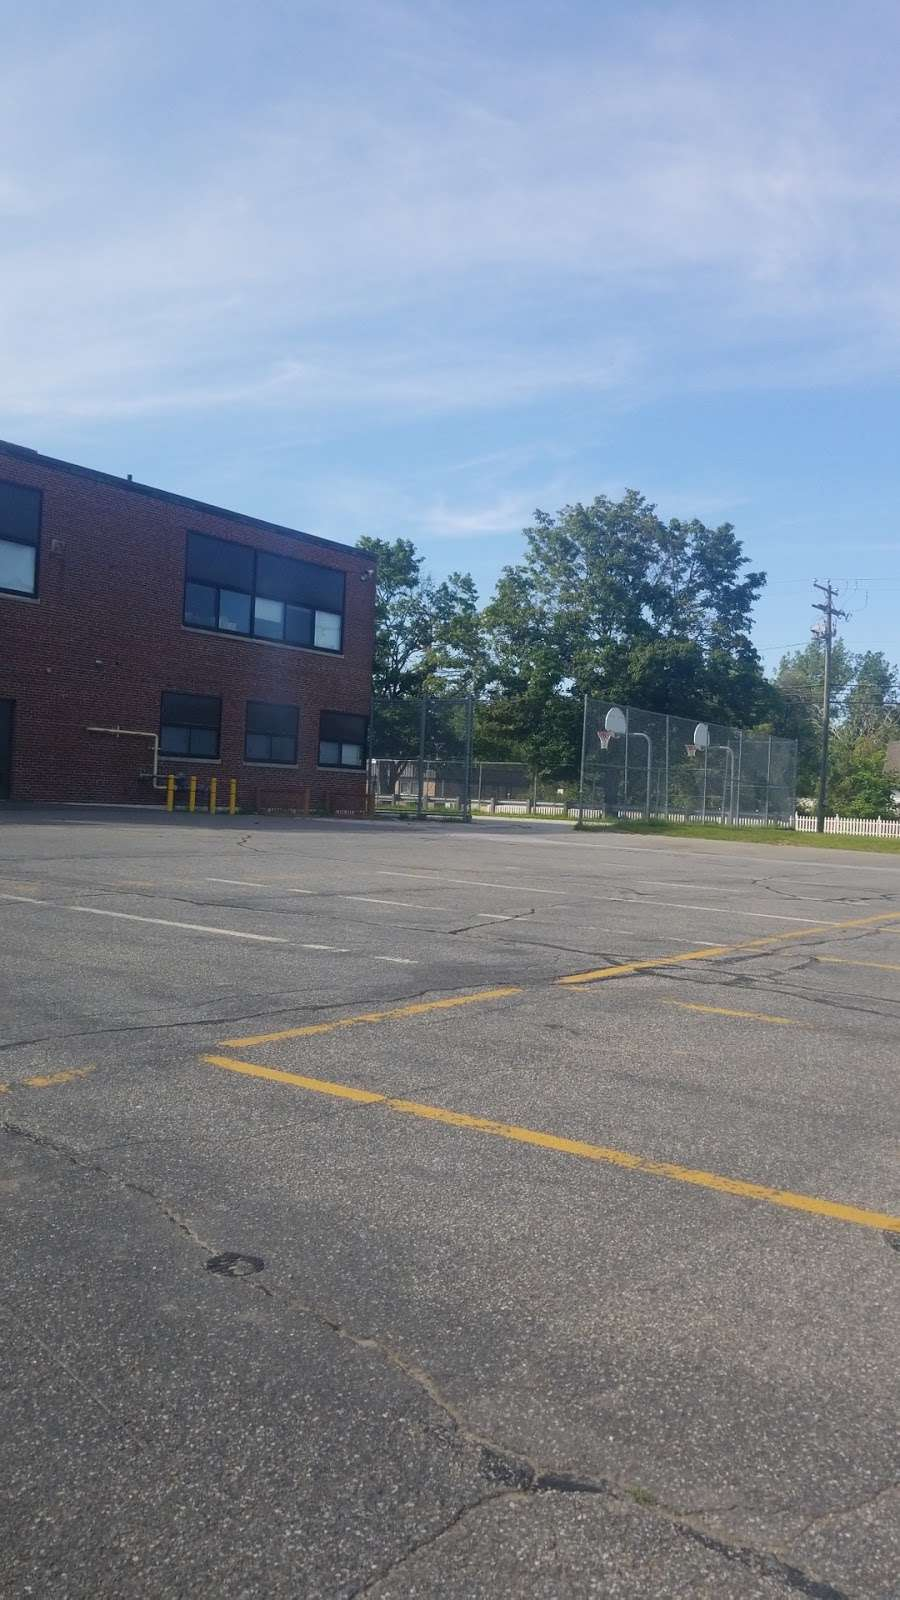 James Mastricola Upper Elementary School - school    Photo 2 of 2   Address: 26 Baboosic Lake Rd, Merrimack, NH 03054, USA   Phone: (603) 424-6221